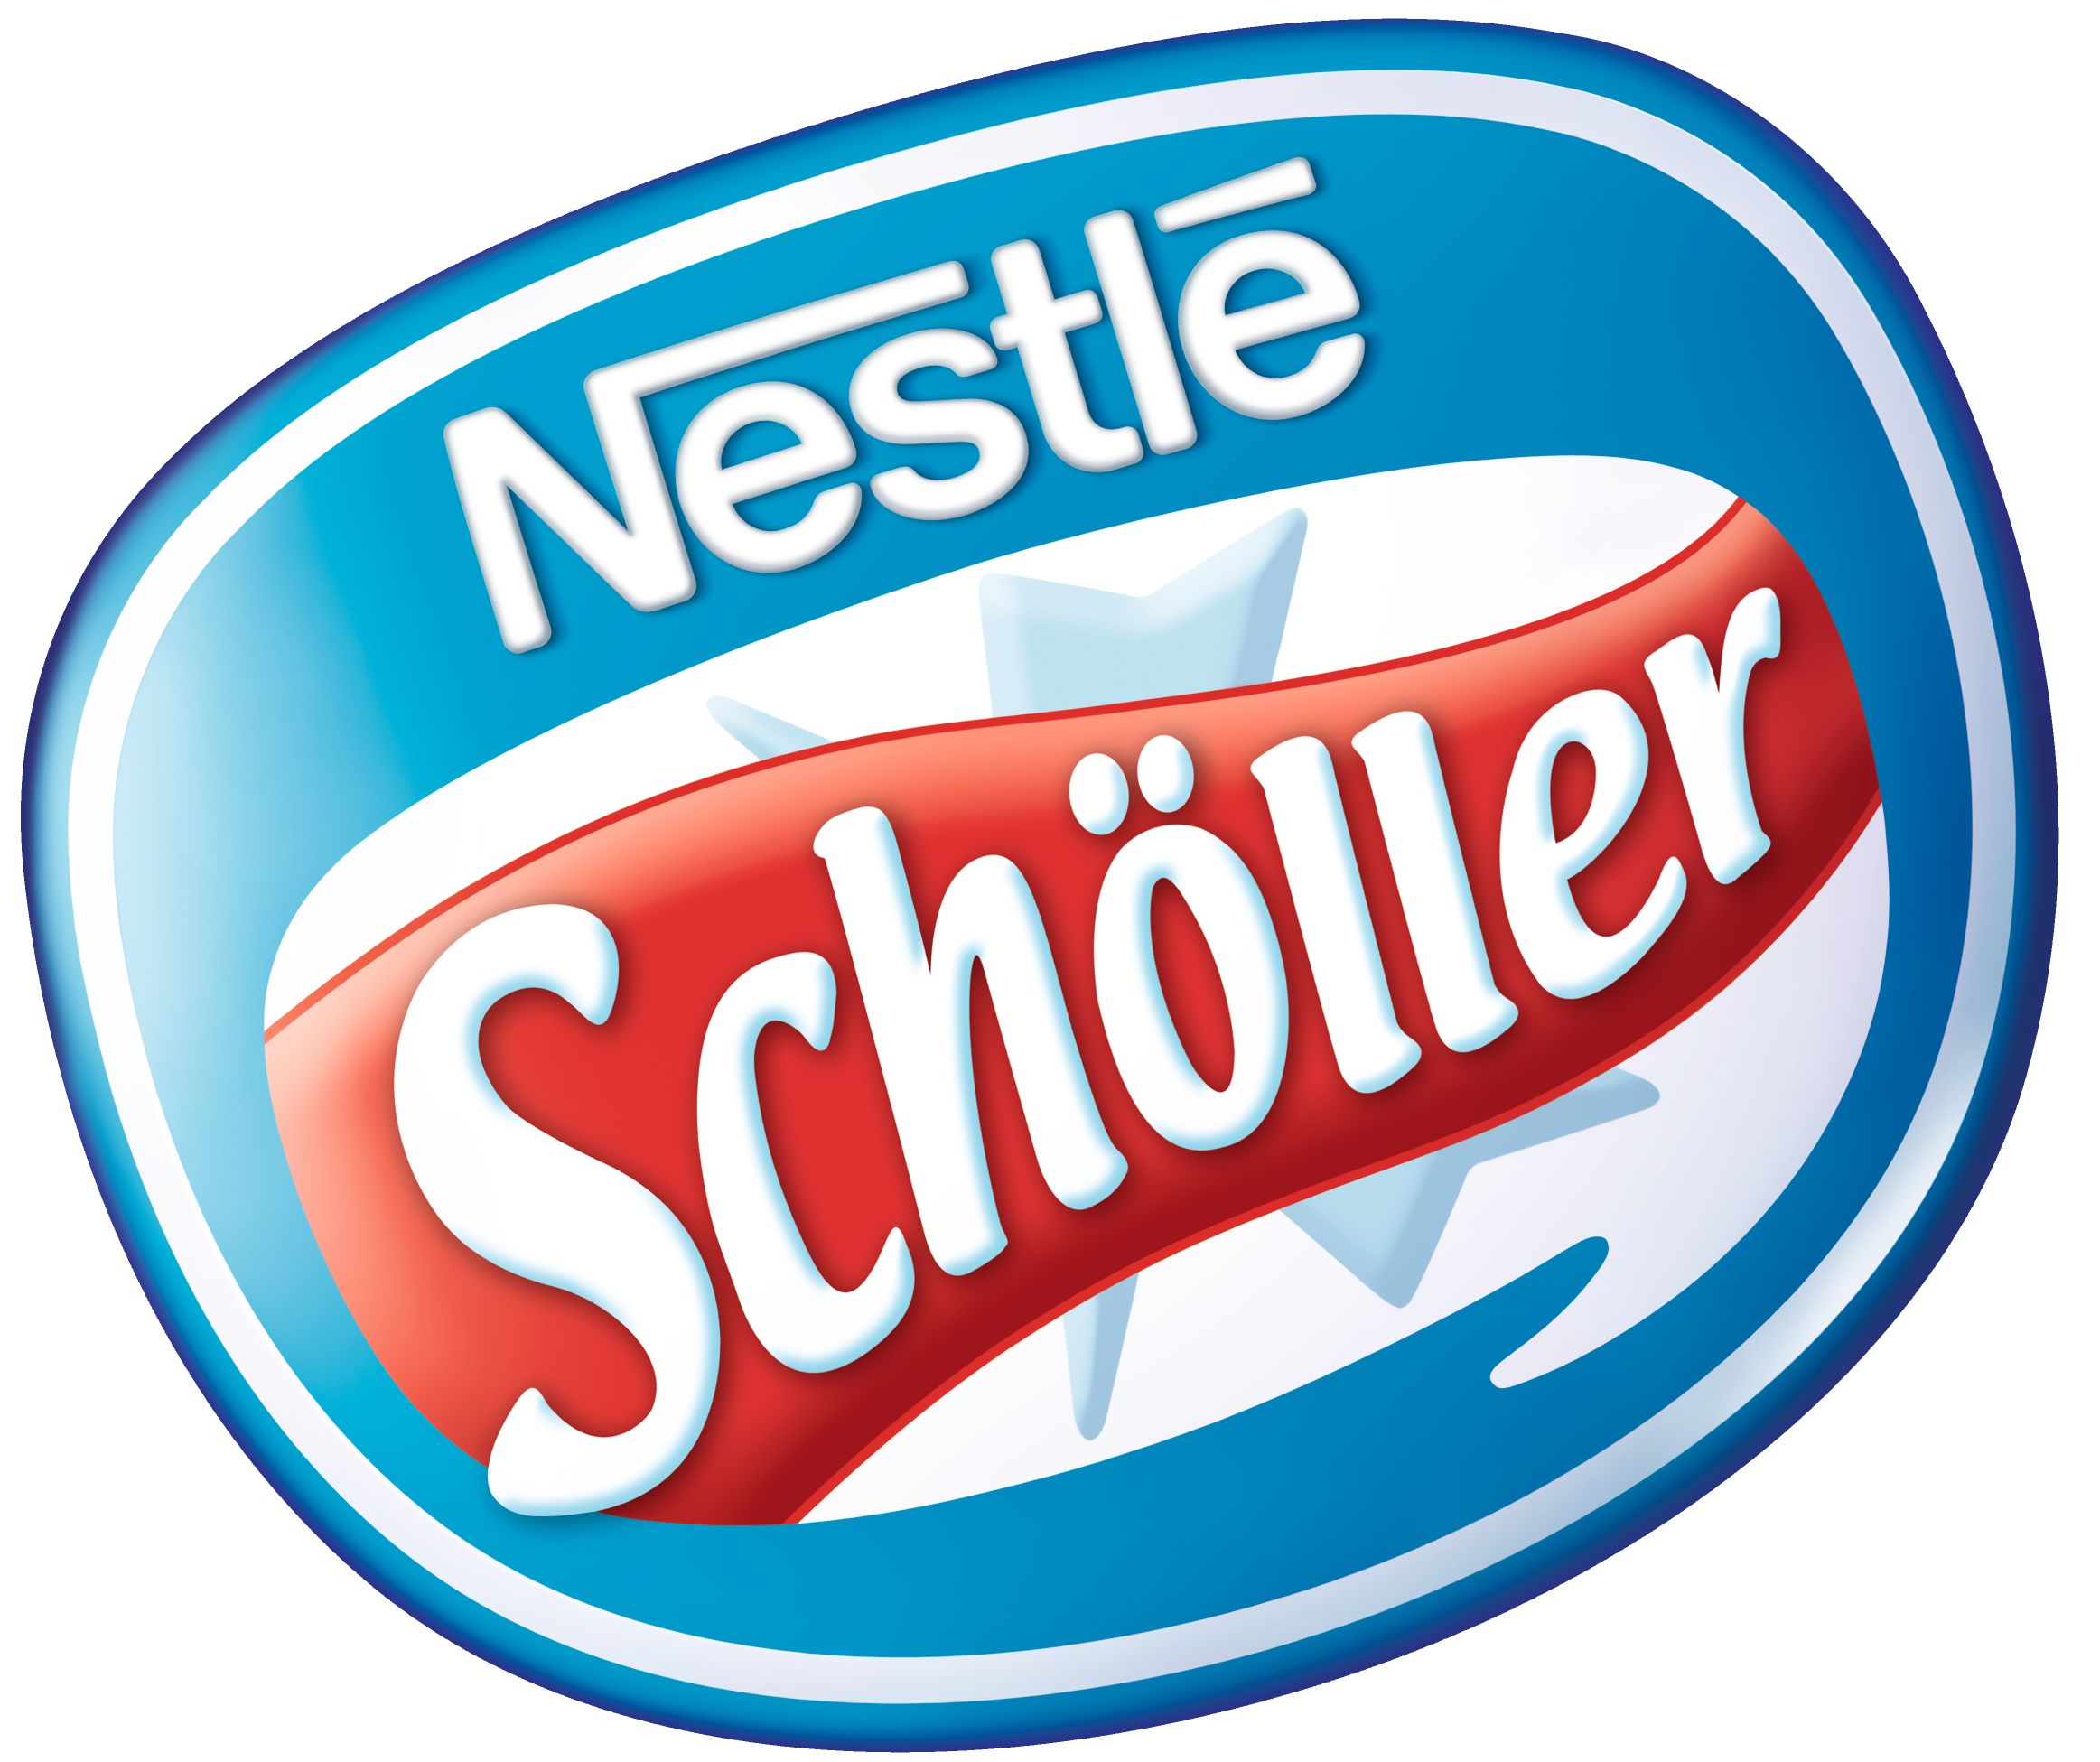 Nestle Scholler 2015